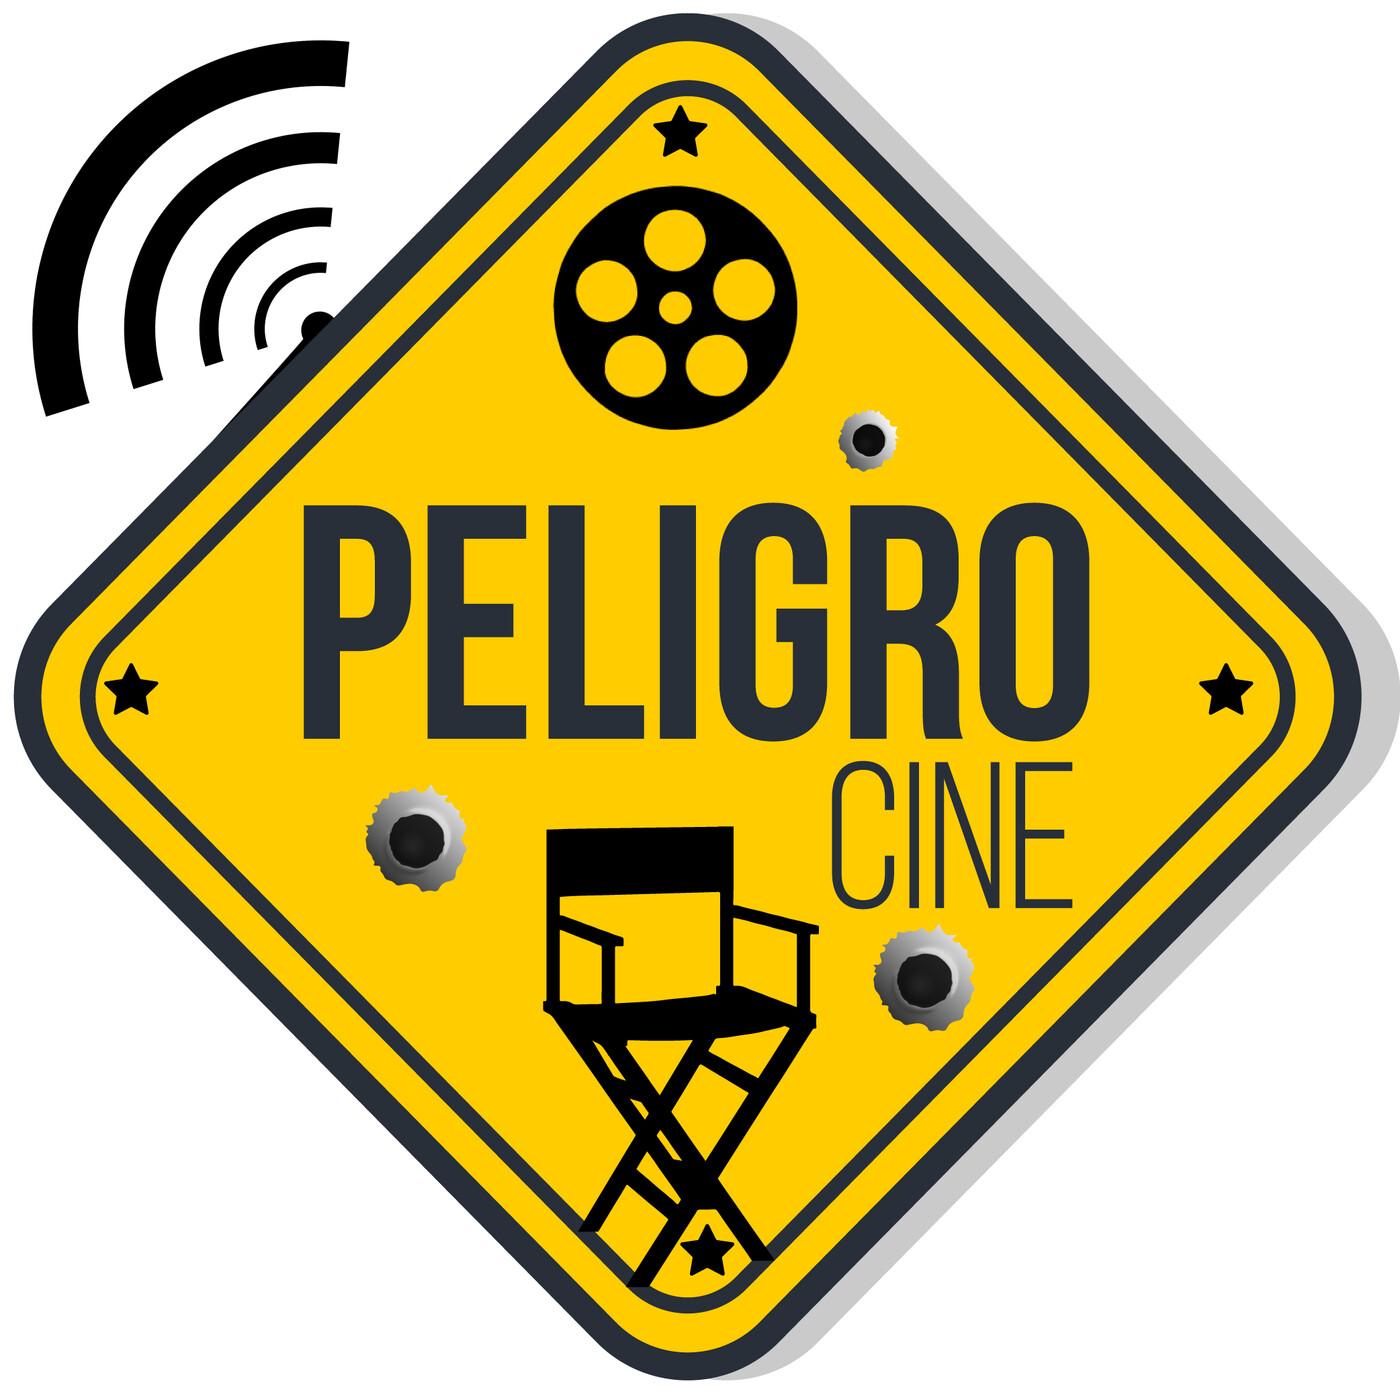 PELIGRO, CINE- 2X01 - Cine y Salud - Invitado: Dr. Dj Kraun - Philadelphia - House - Adam Sandler - Amber Heard -